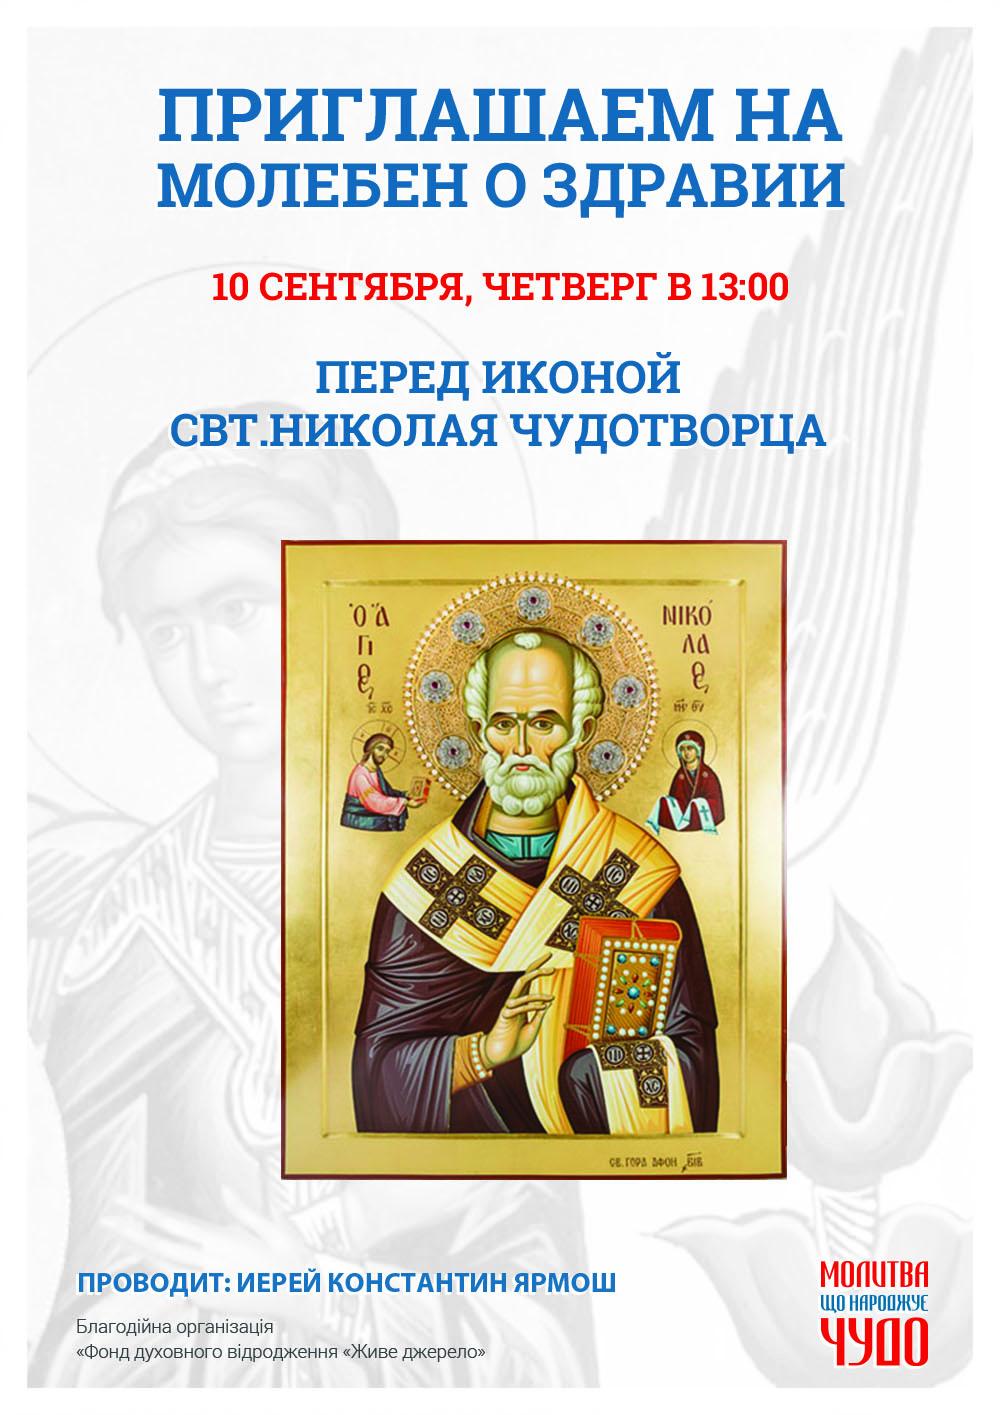 Молебен о здравии Киев. Икона Николая Чудотворца